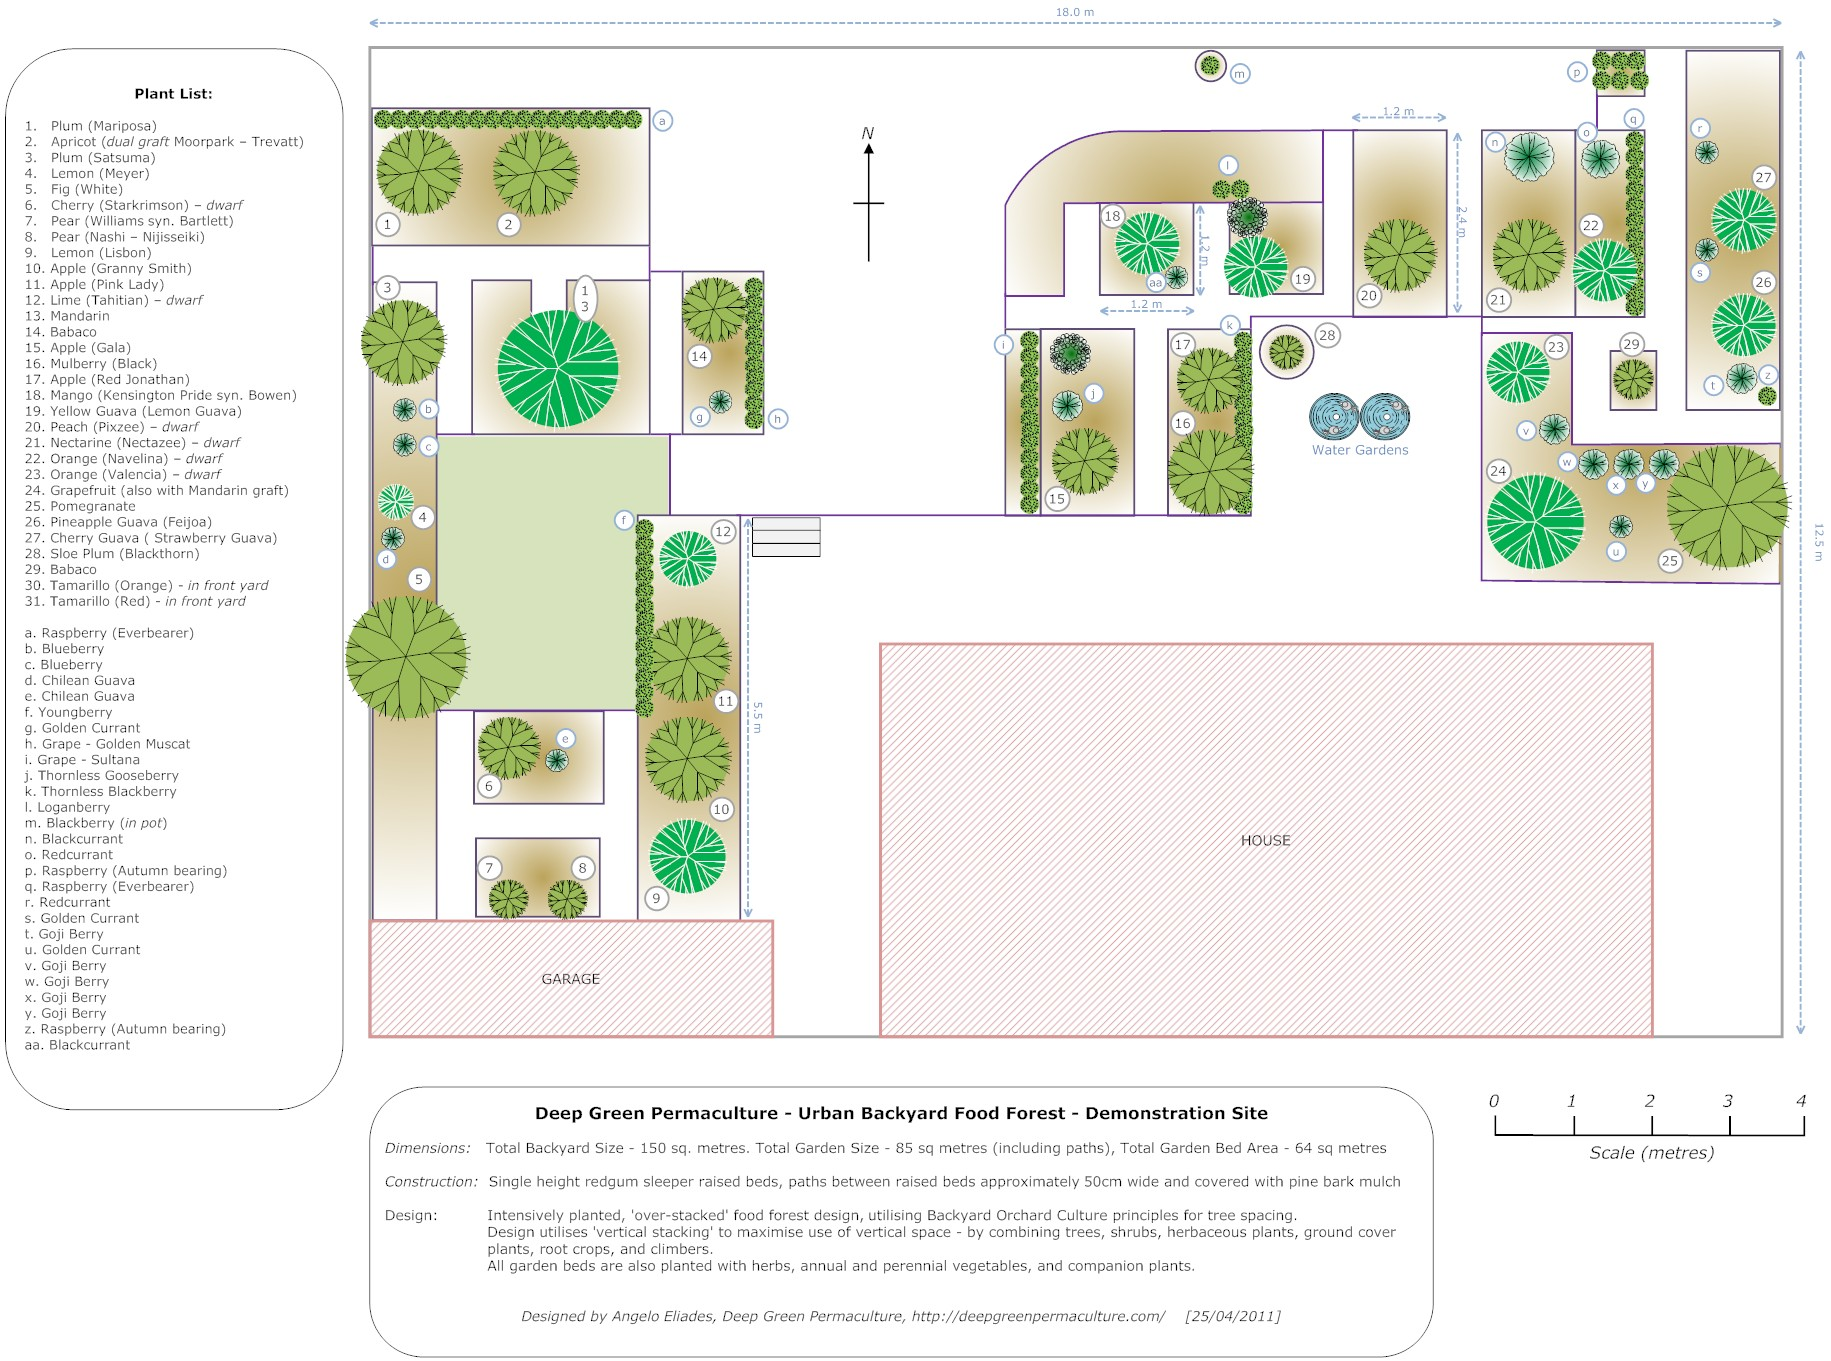 Garden Design North Facing 02. design & construction | deep green permaculture